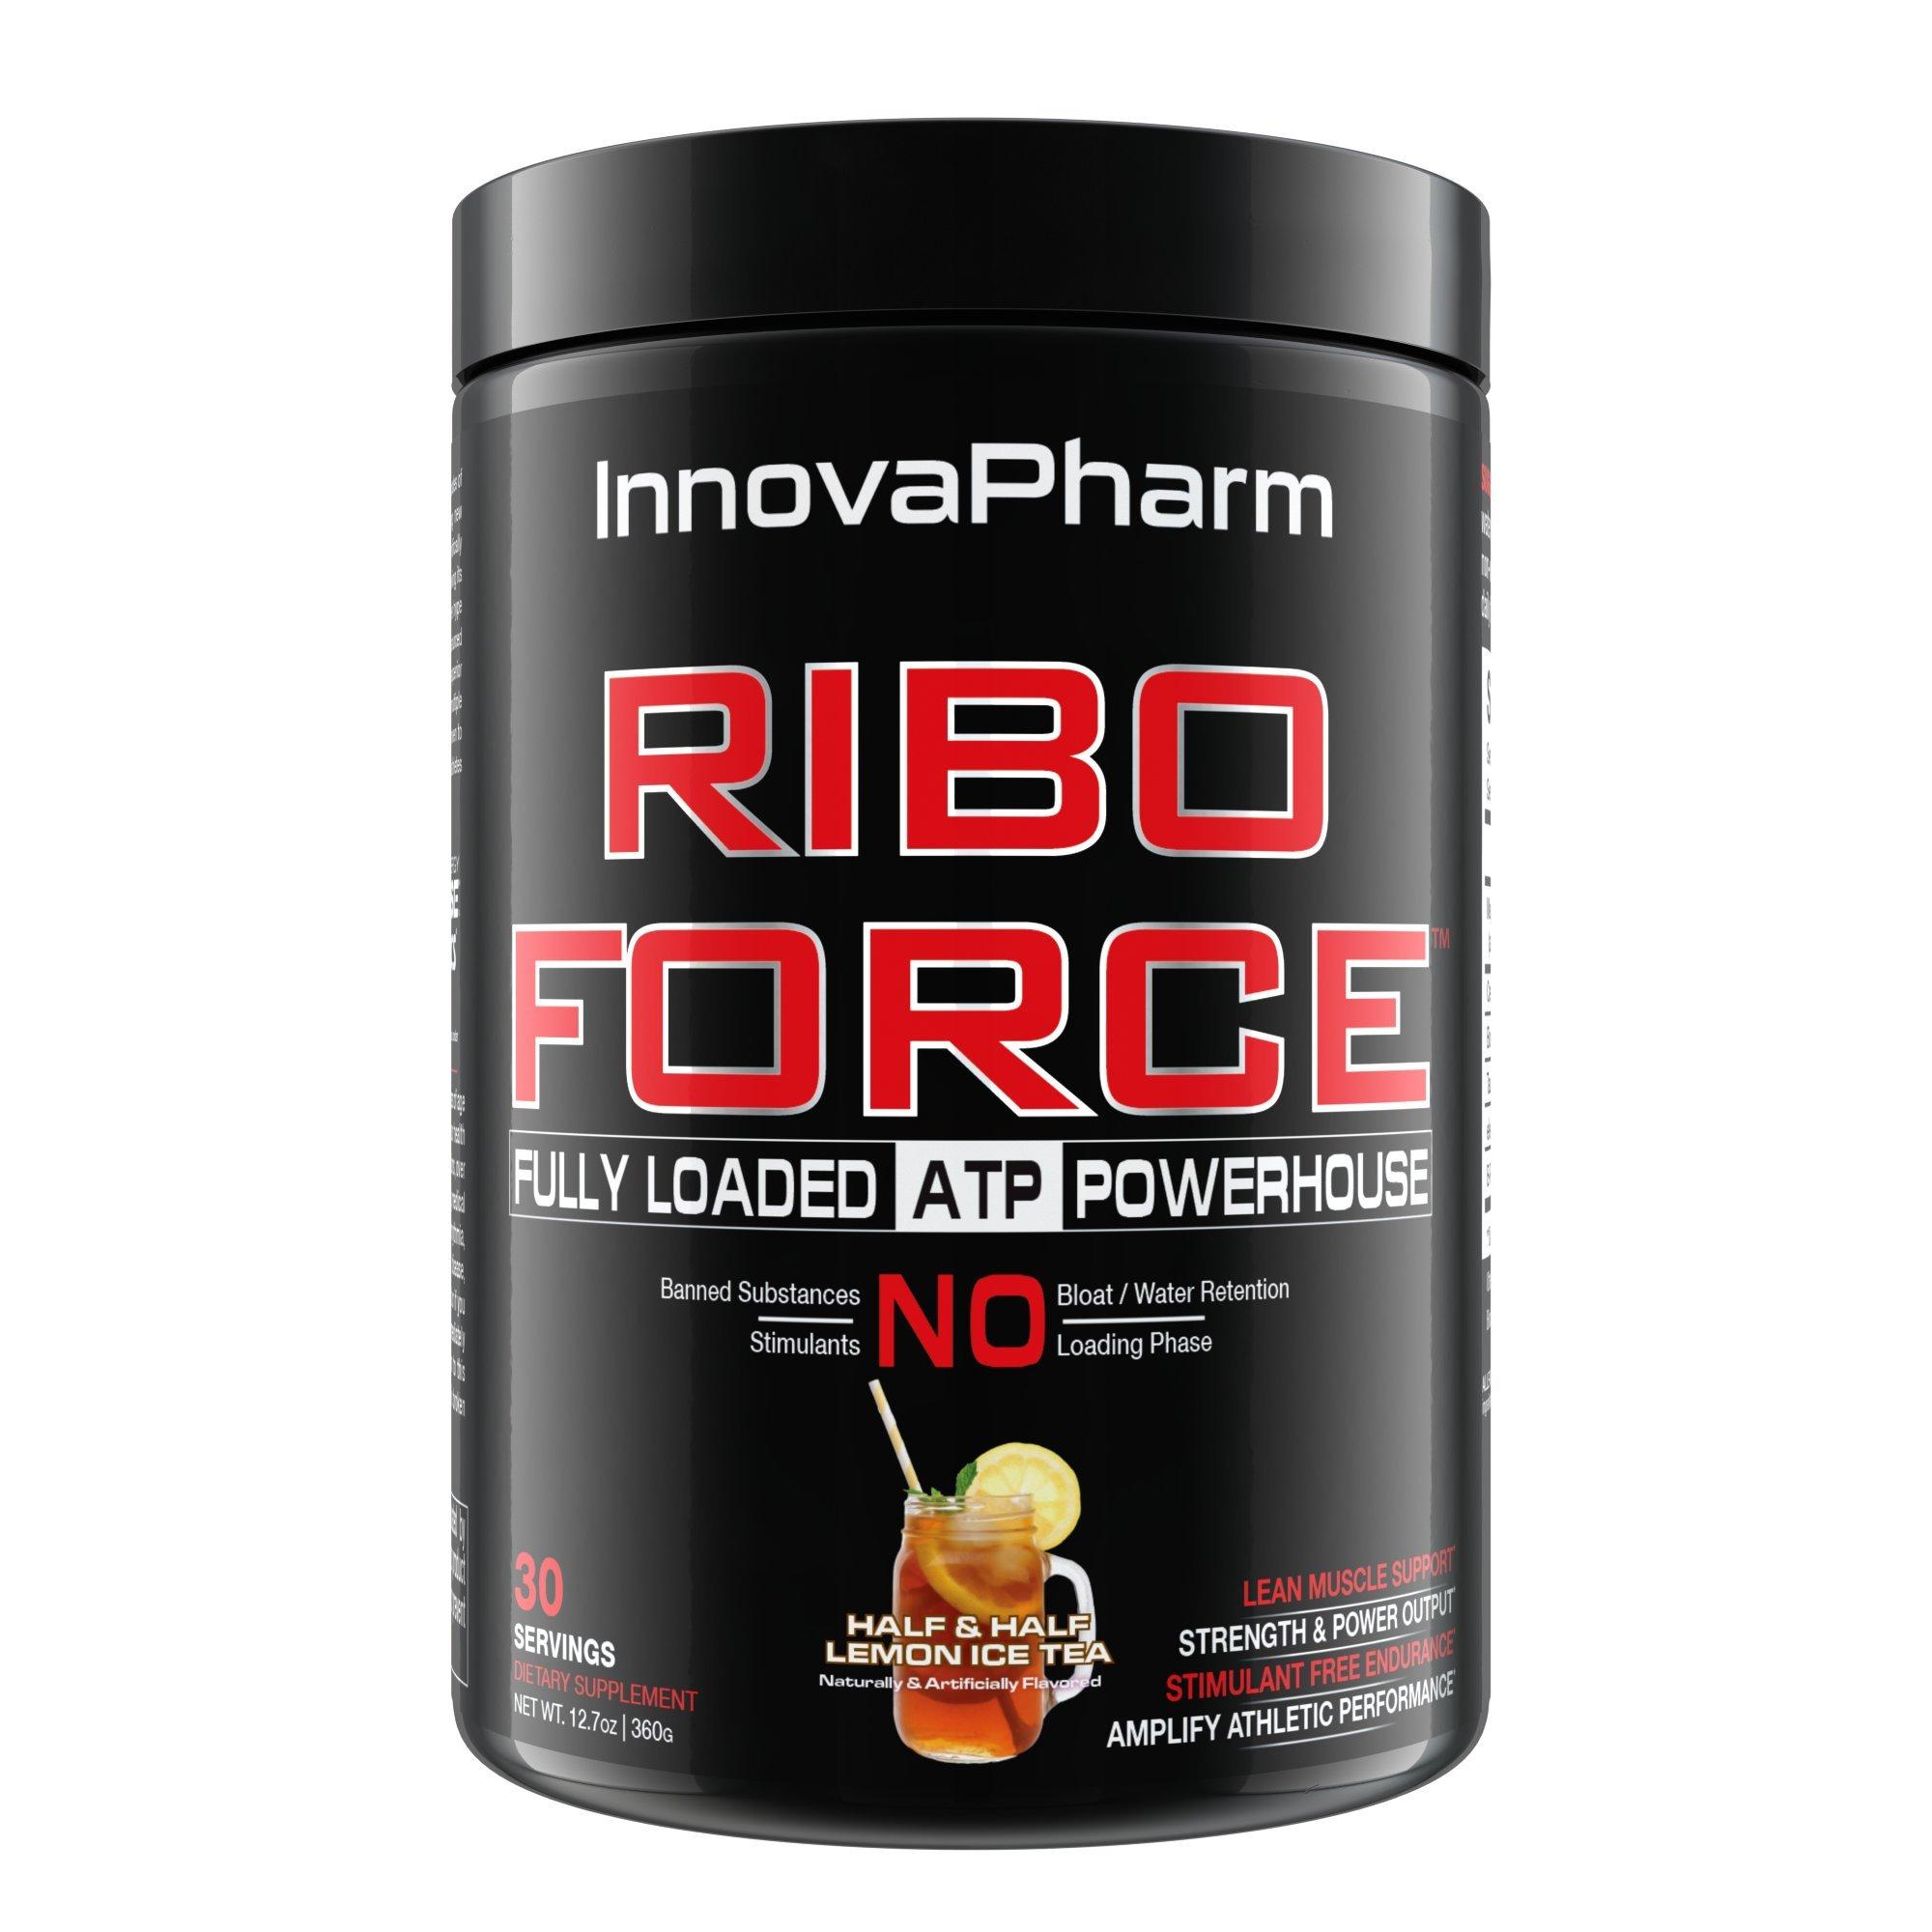 RiboForce - Half & Half Lemon Iced Tea - 30 Servings by InnovaPharm